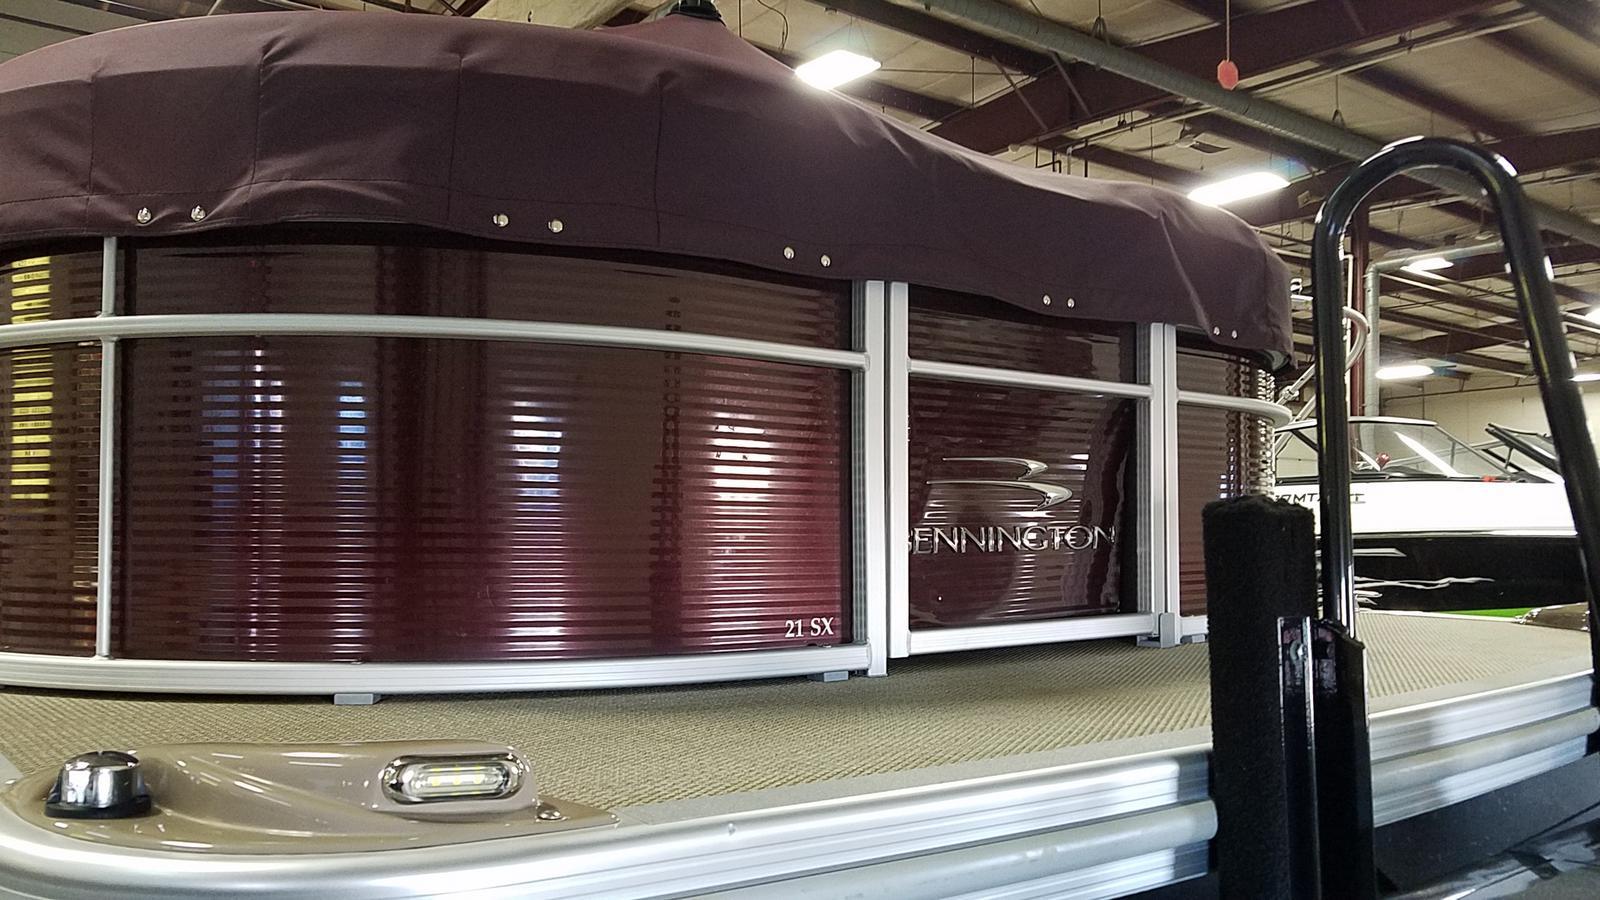 2019 Bennington boat for sale, model of the boat is 21 SLX & Image # 4 of 15